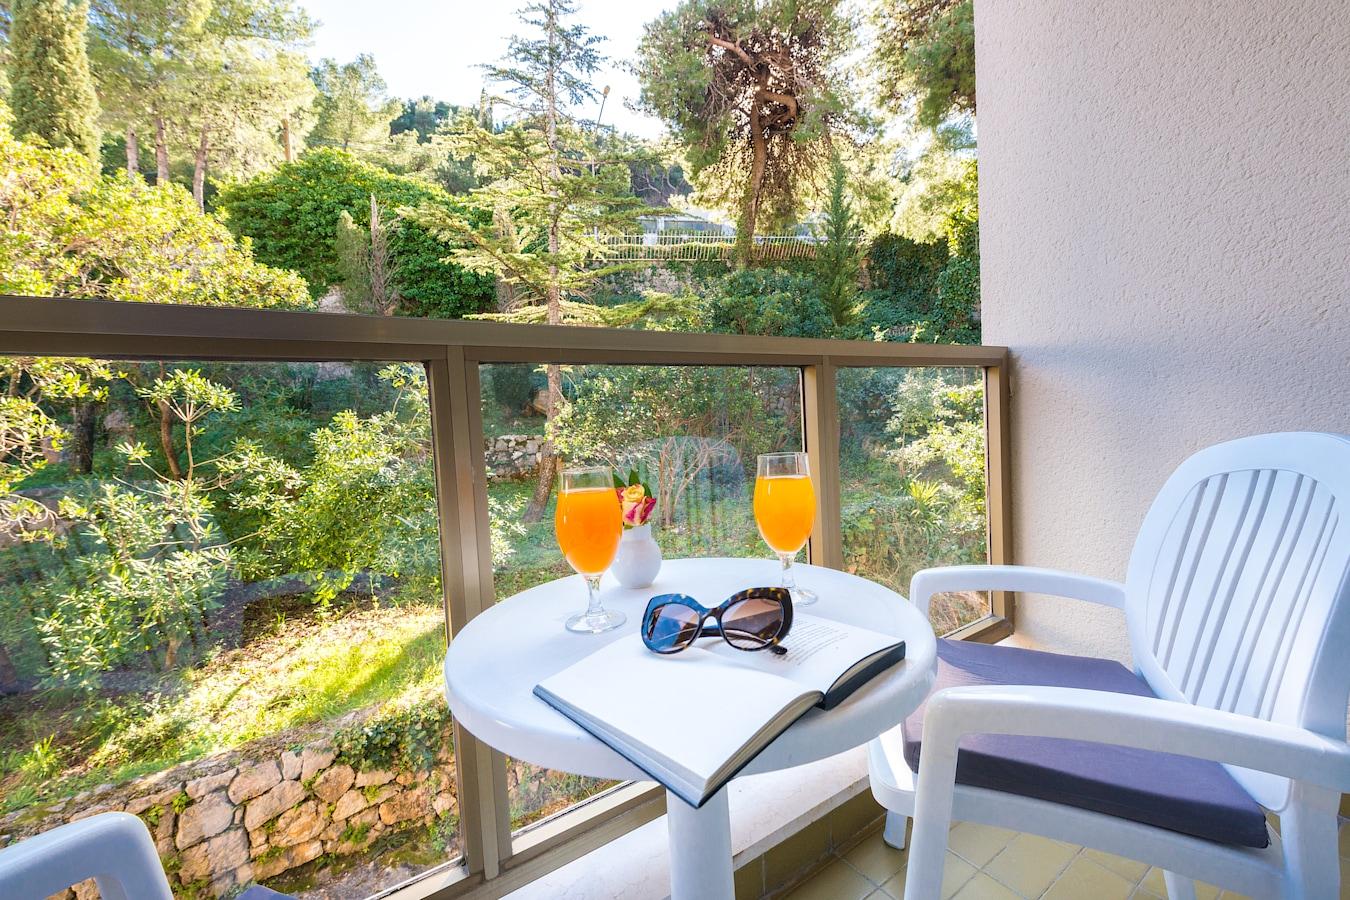 vis-hotel-dubrovnik-balcony-park-view.jpg